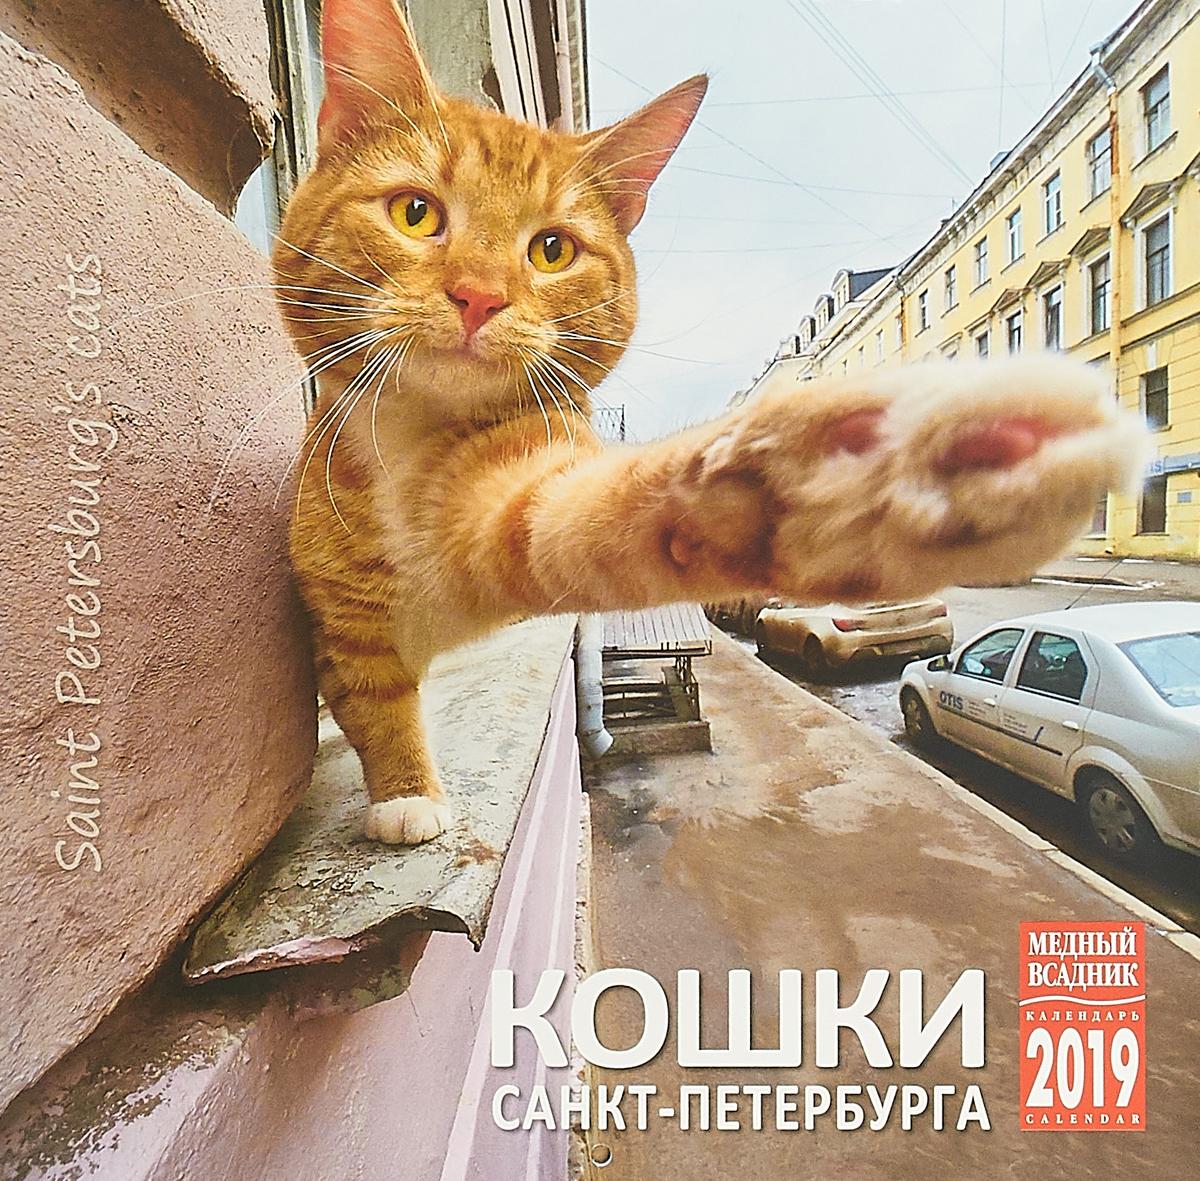 Календарь на спирали на 2019 год. Кошки Петербурга календарь на спирали на 2019 год стражи санкт петербурга